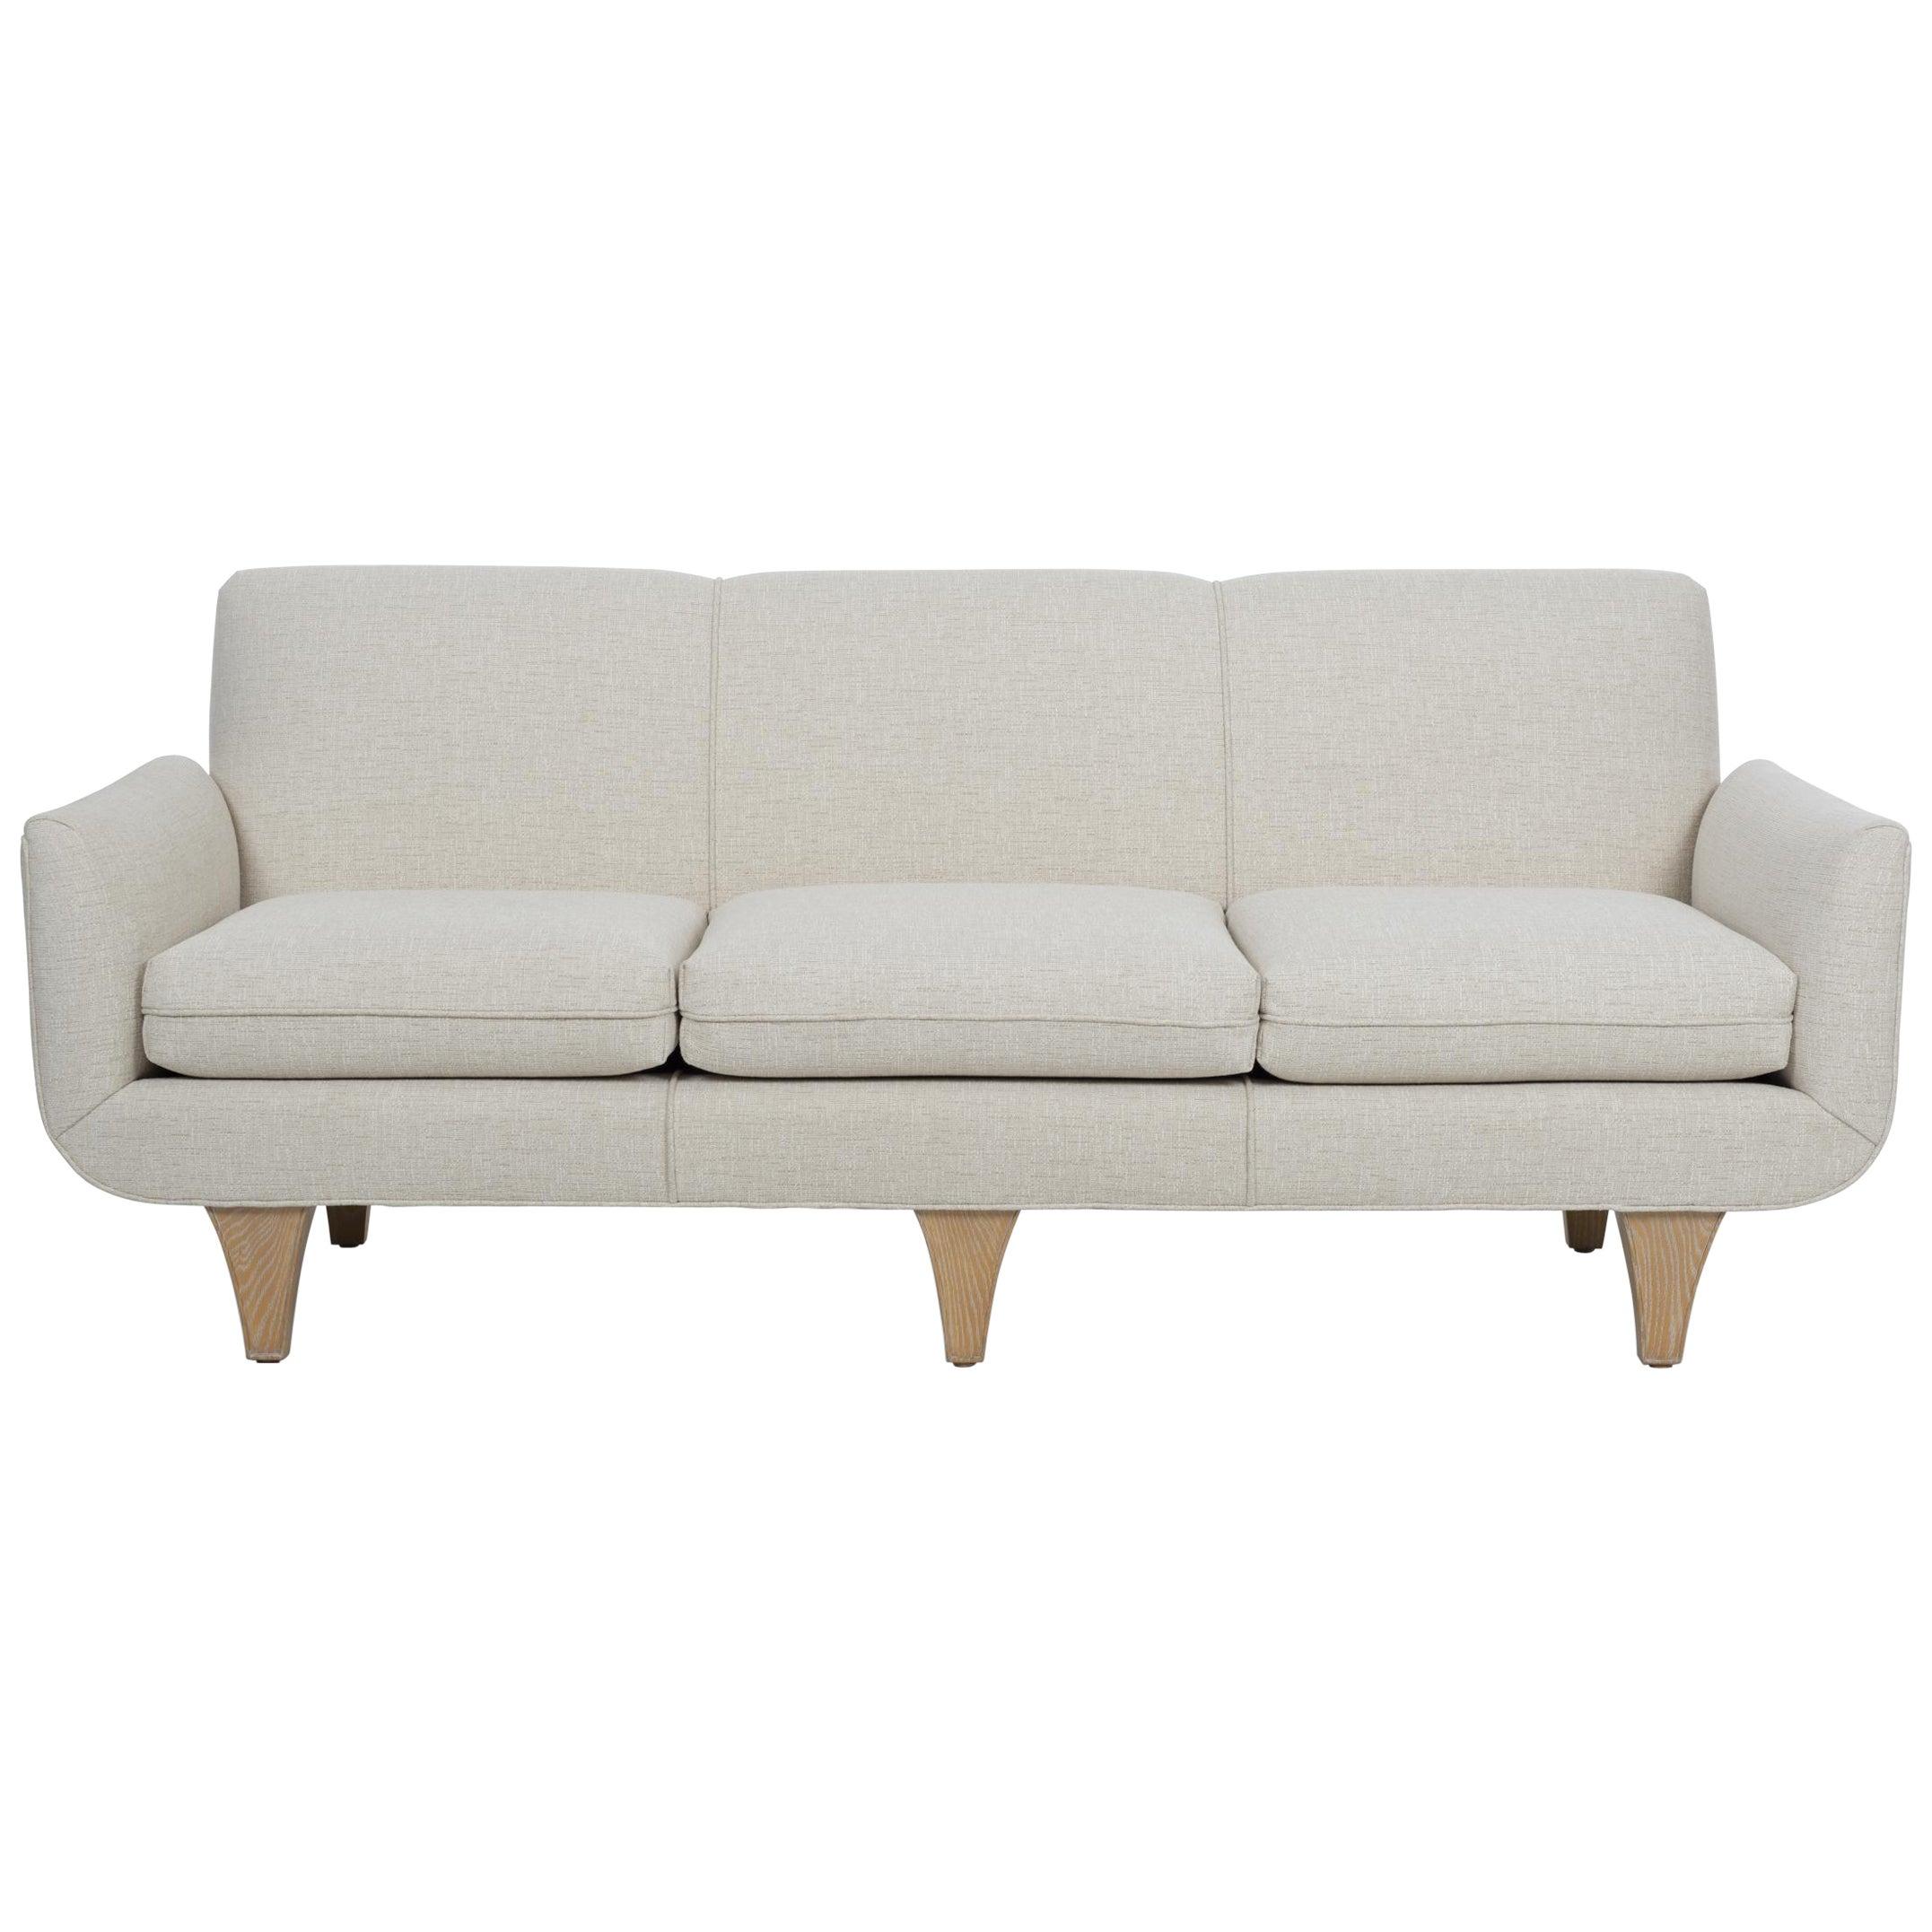 Tommi Parzinger Sofa for Parzinger Originals